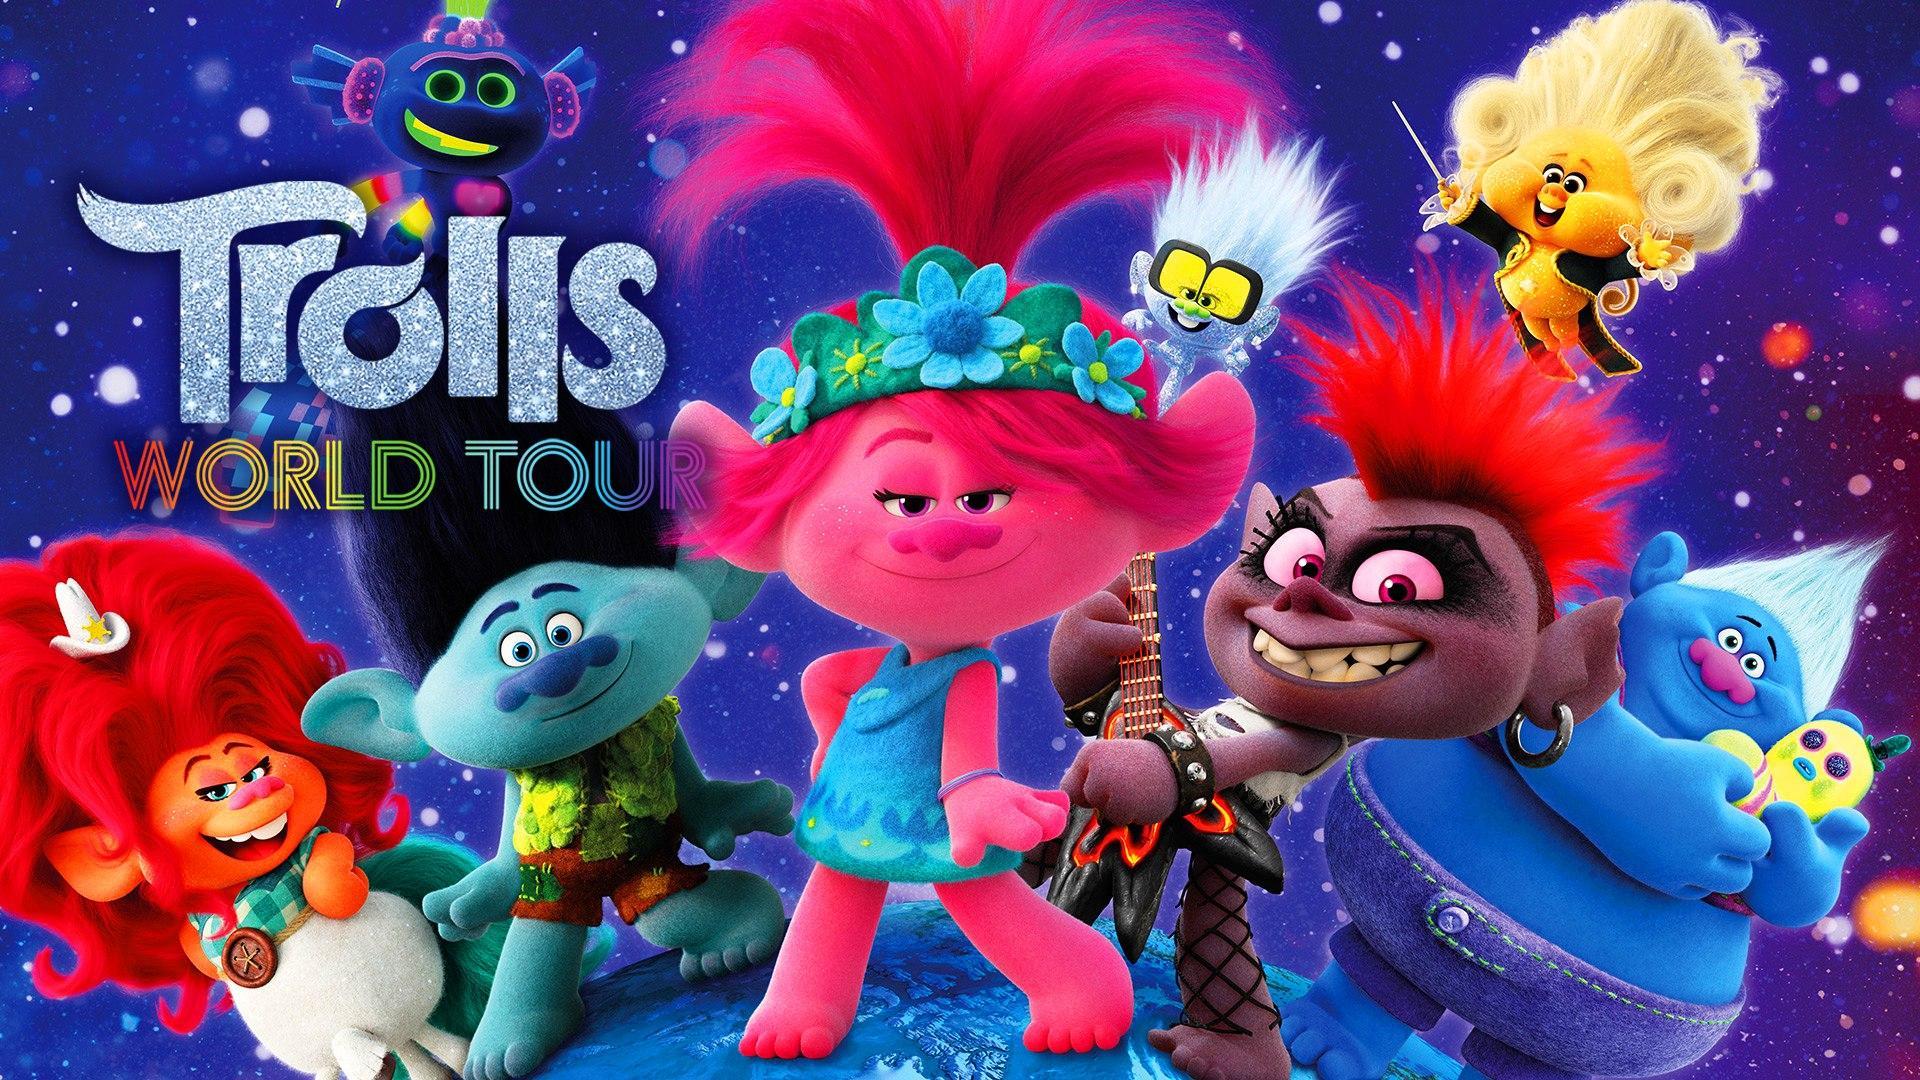 Giovedi 24 Dicembre 2020 Sky e Premium Cinema, Trolls World Tour